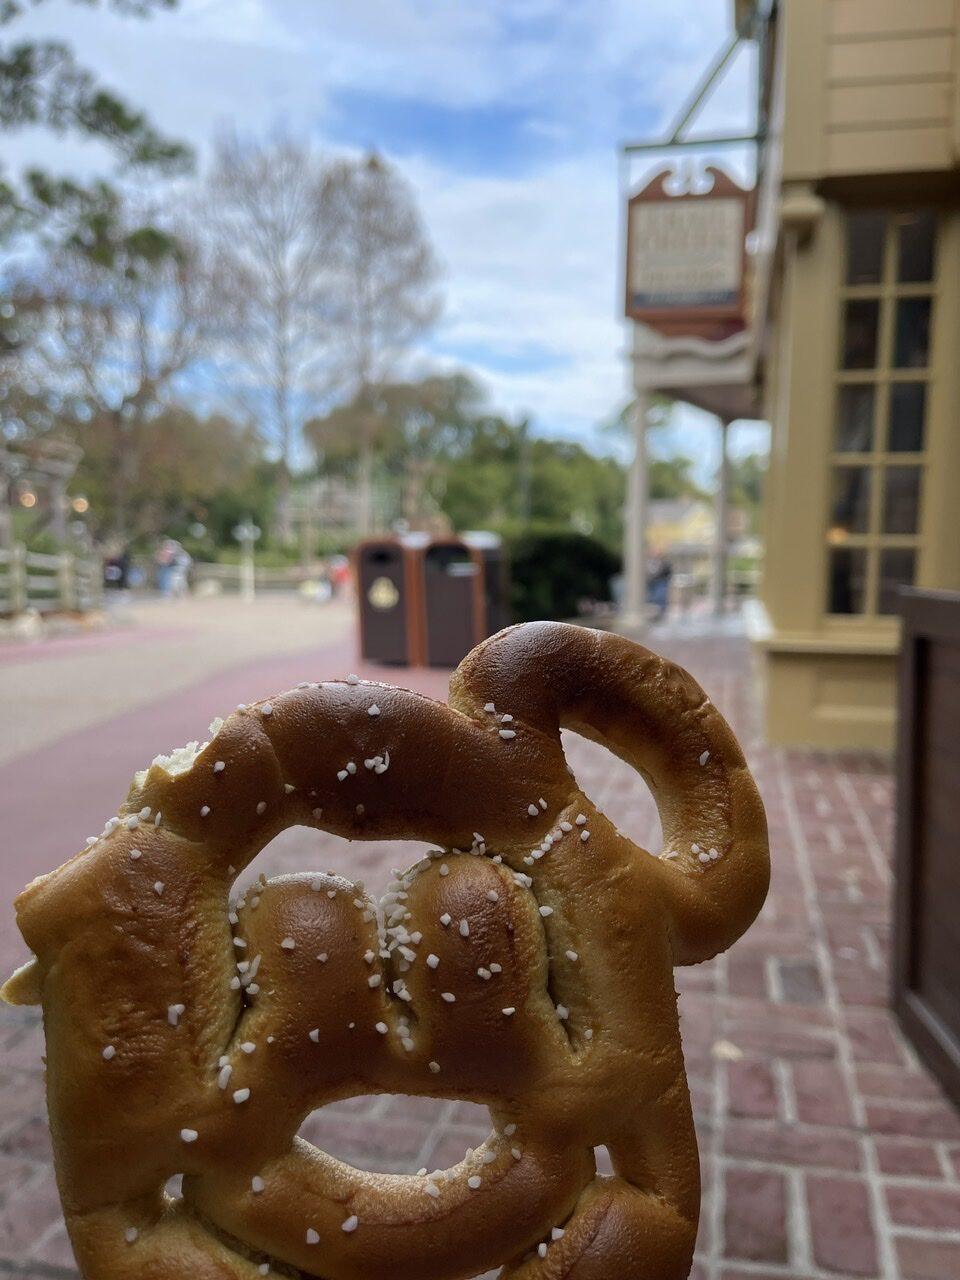 Mickey Mouse shaped soft pretzel